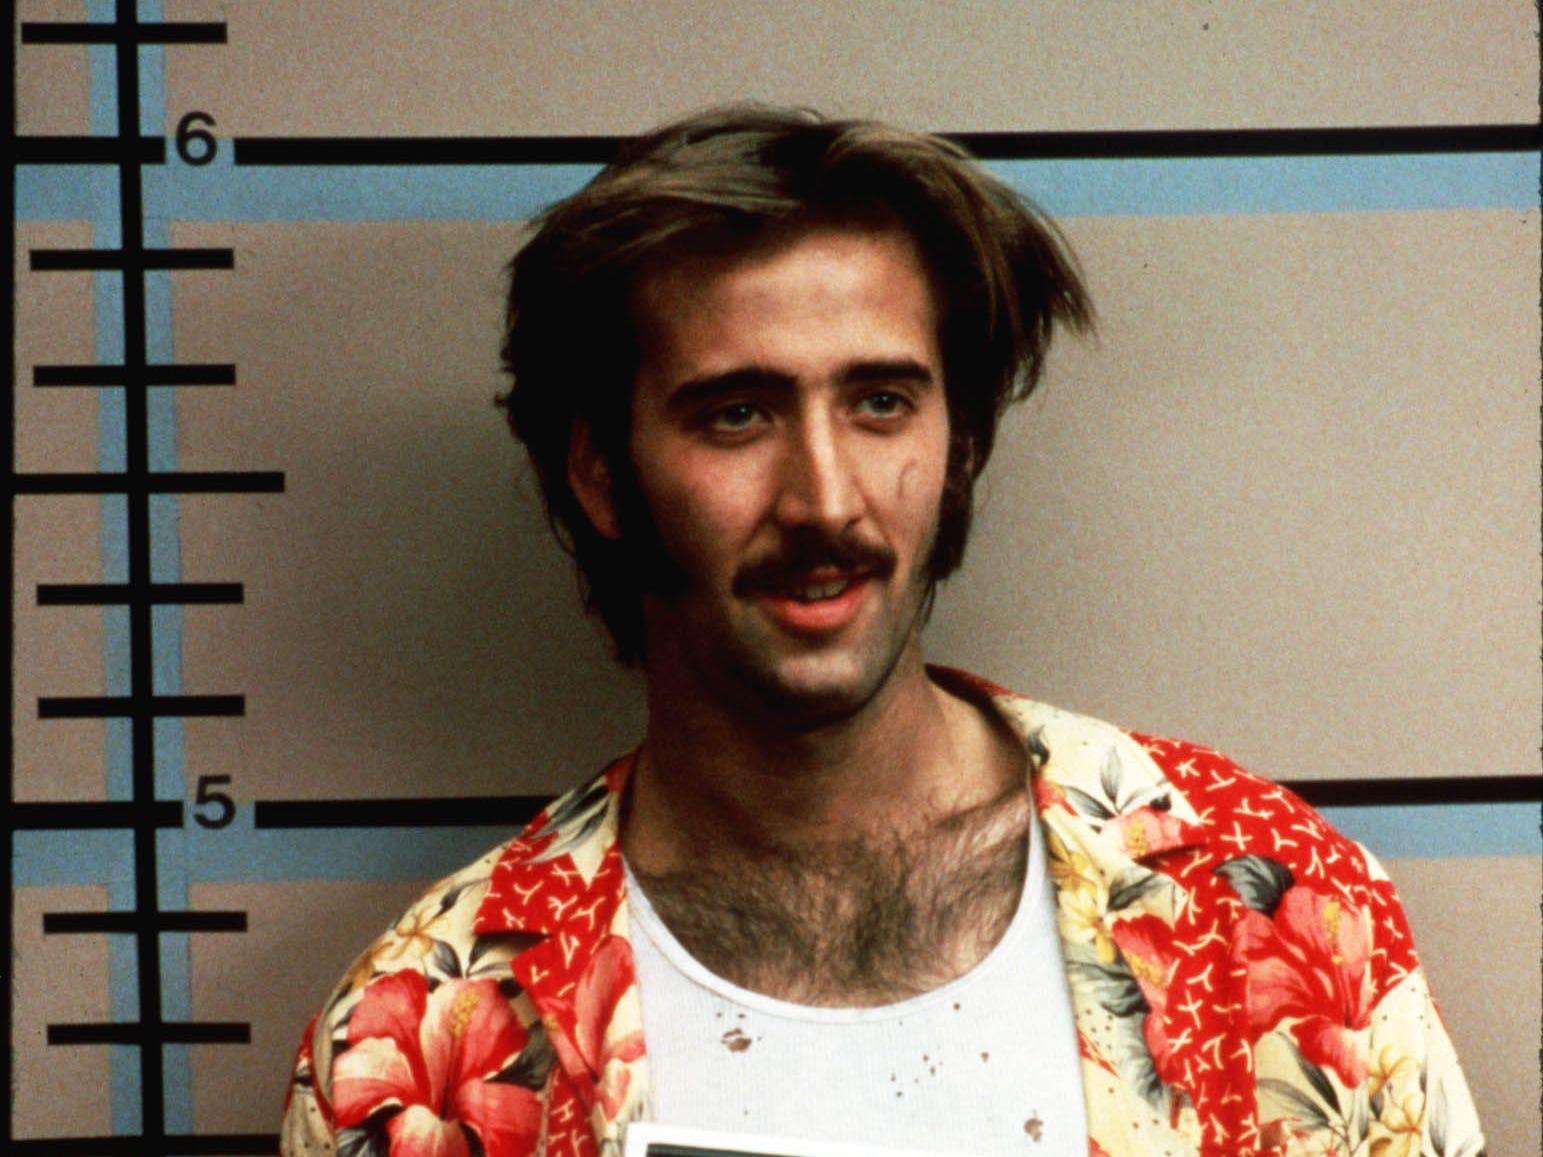 Nicolas Cage in Raising Arizona  --- DATE TAKEN: 1987  By Melinda Sue Gordon   20th Century Fox , Source: 20th Century Fox       HO      - handout ORG XMIT: UT77656